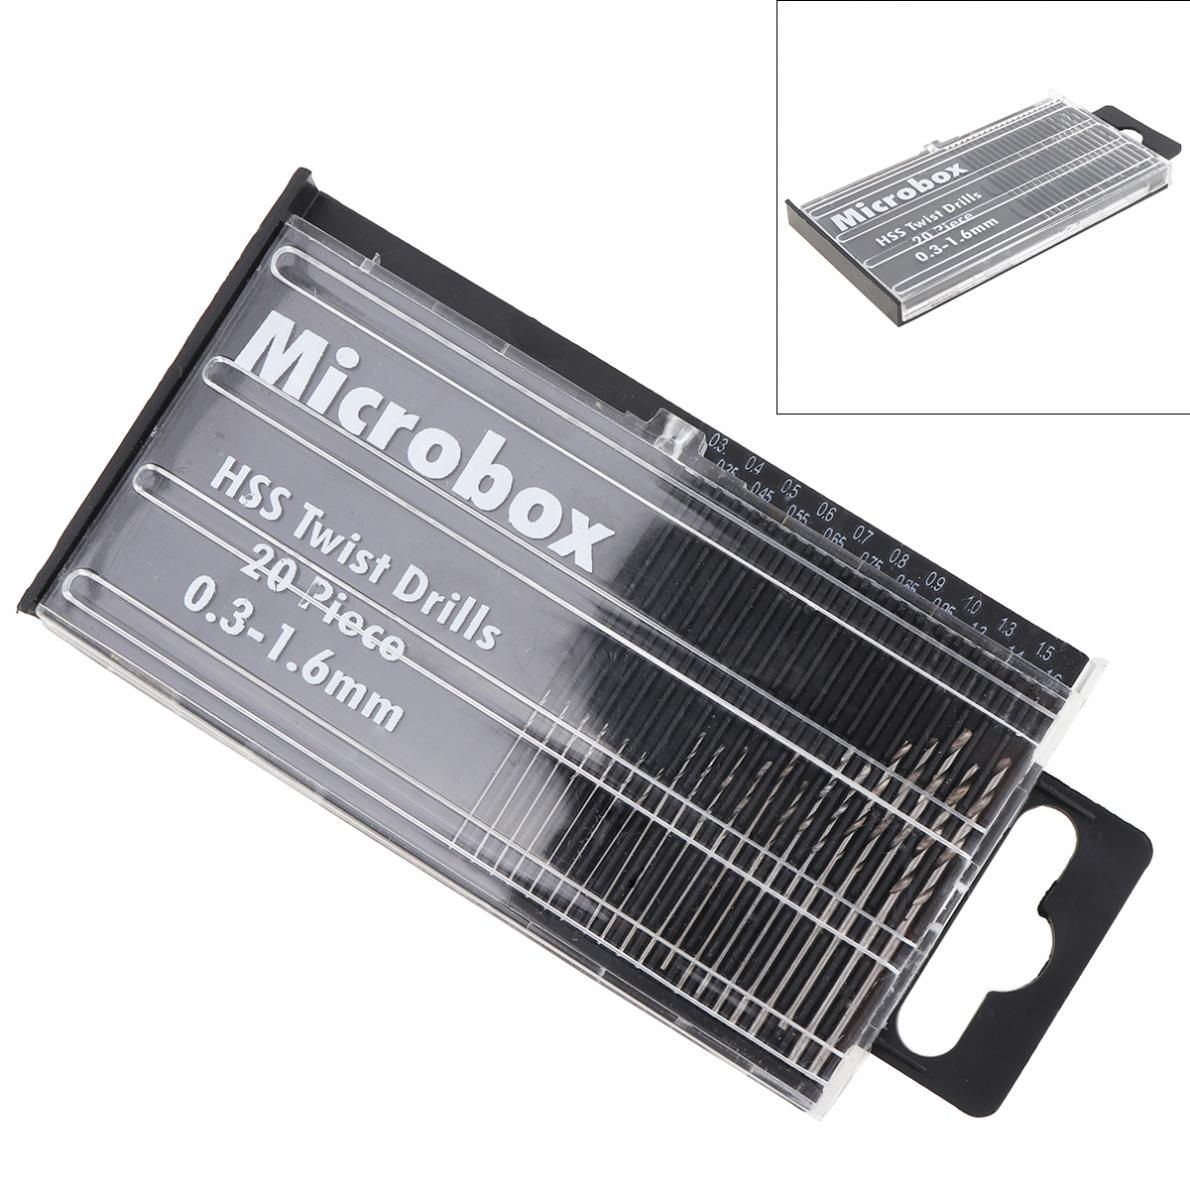 20pcs/lot Mini Small HSS Precision Twist Drills Bit Craft Hobby 0.3-1.6mm For Wood / Plastic Products / Circuit Boards